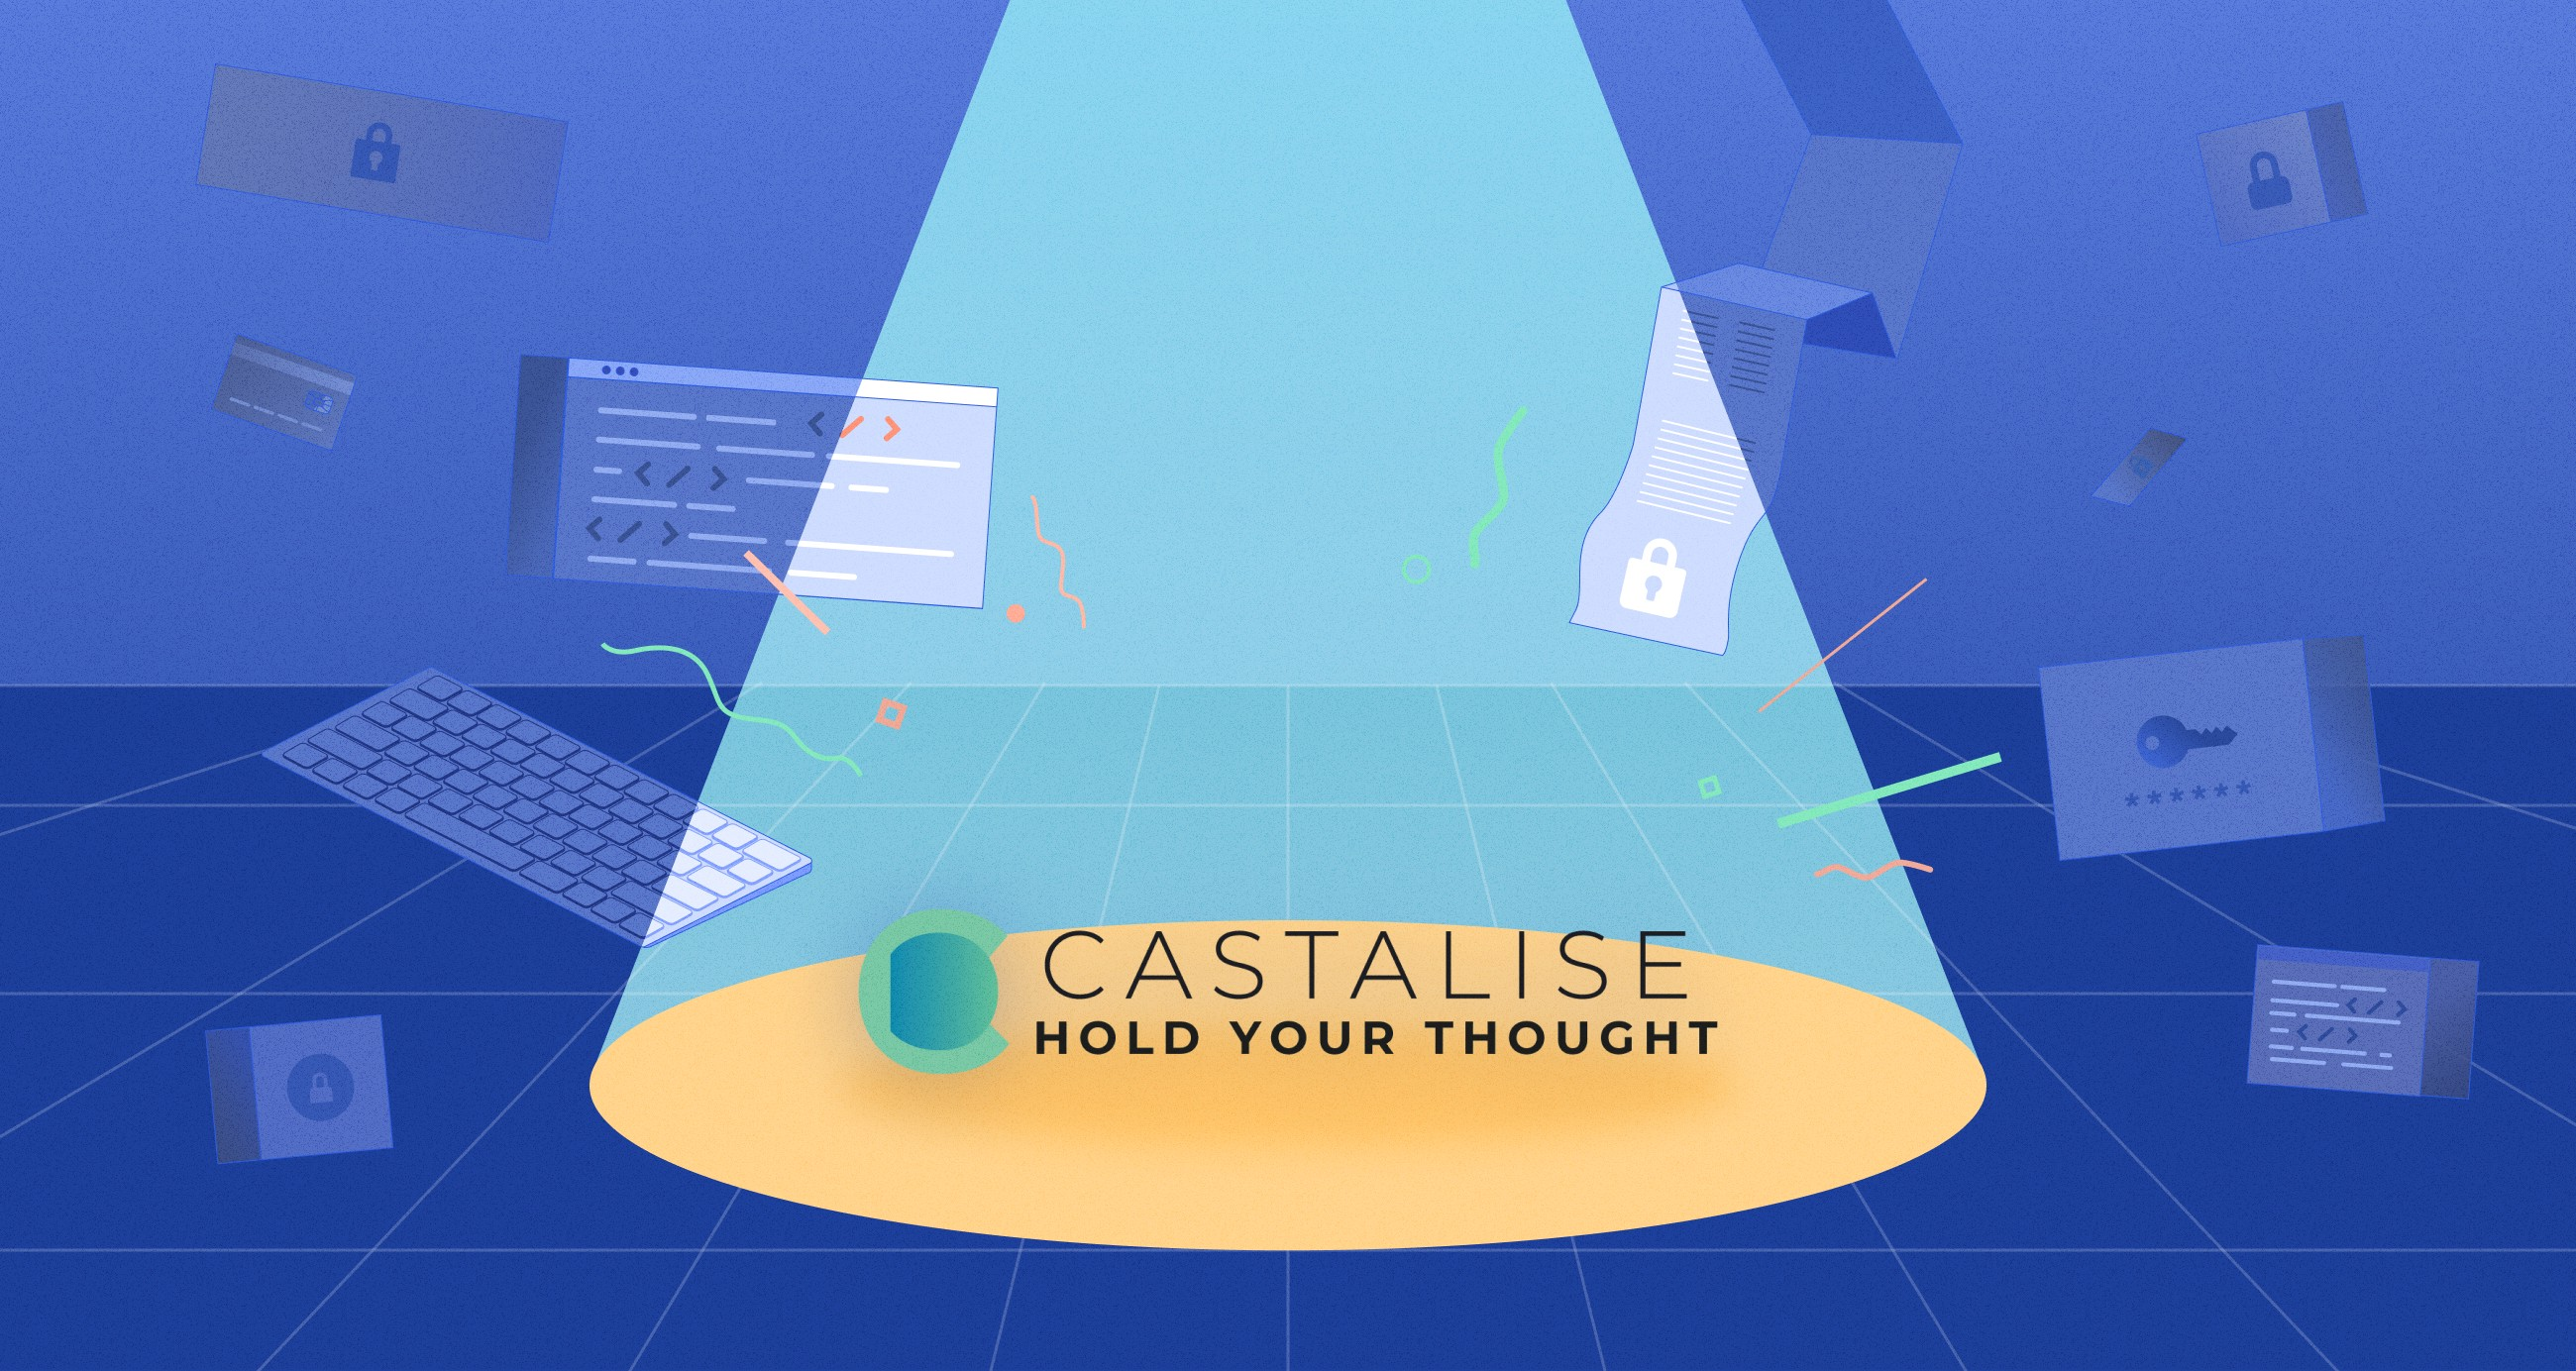 Spotlight: Castalise